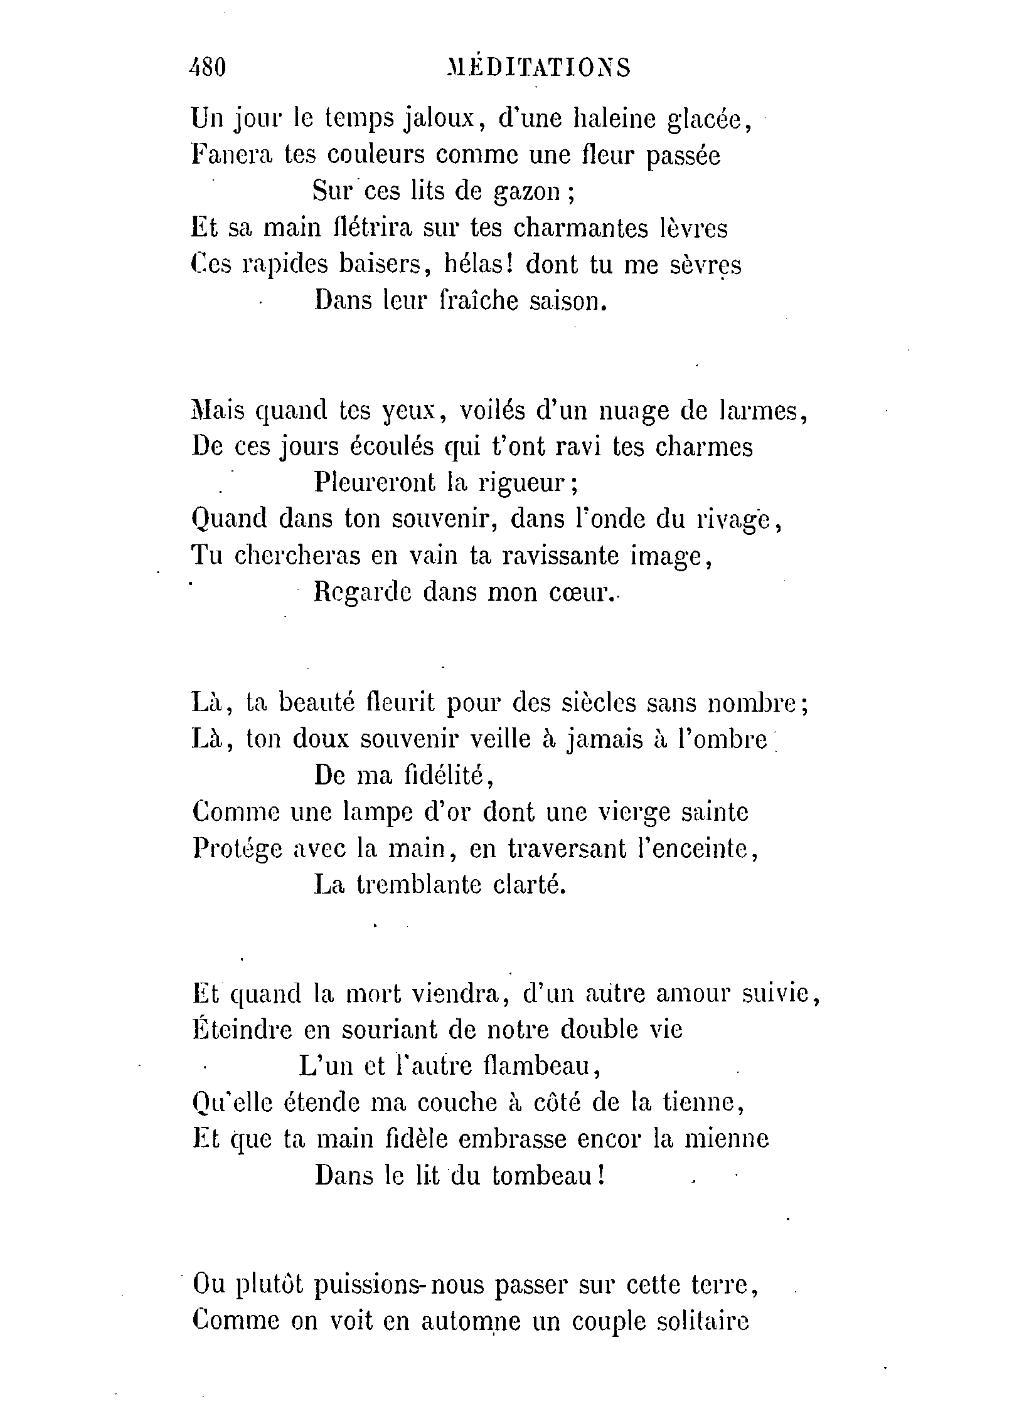 Page Lamartine œuvres Completes De Lamartine Tome 1 Djvu 482